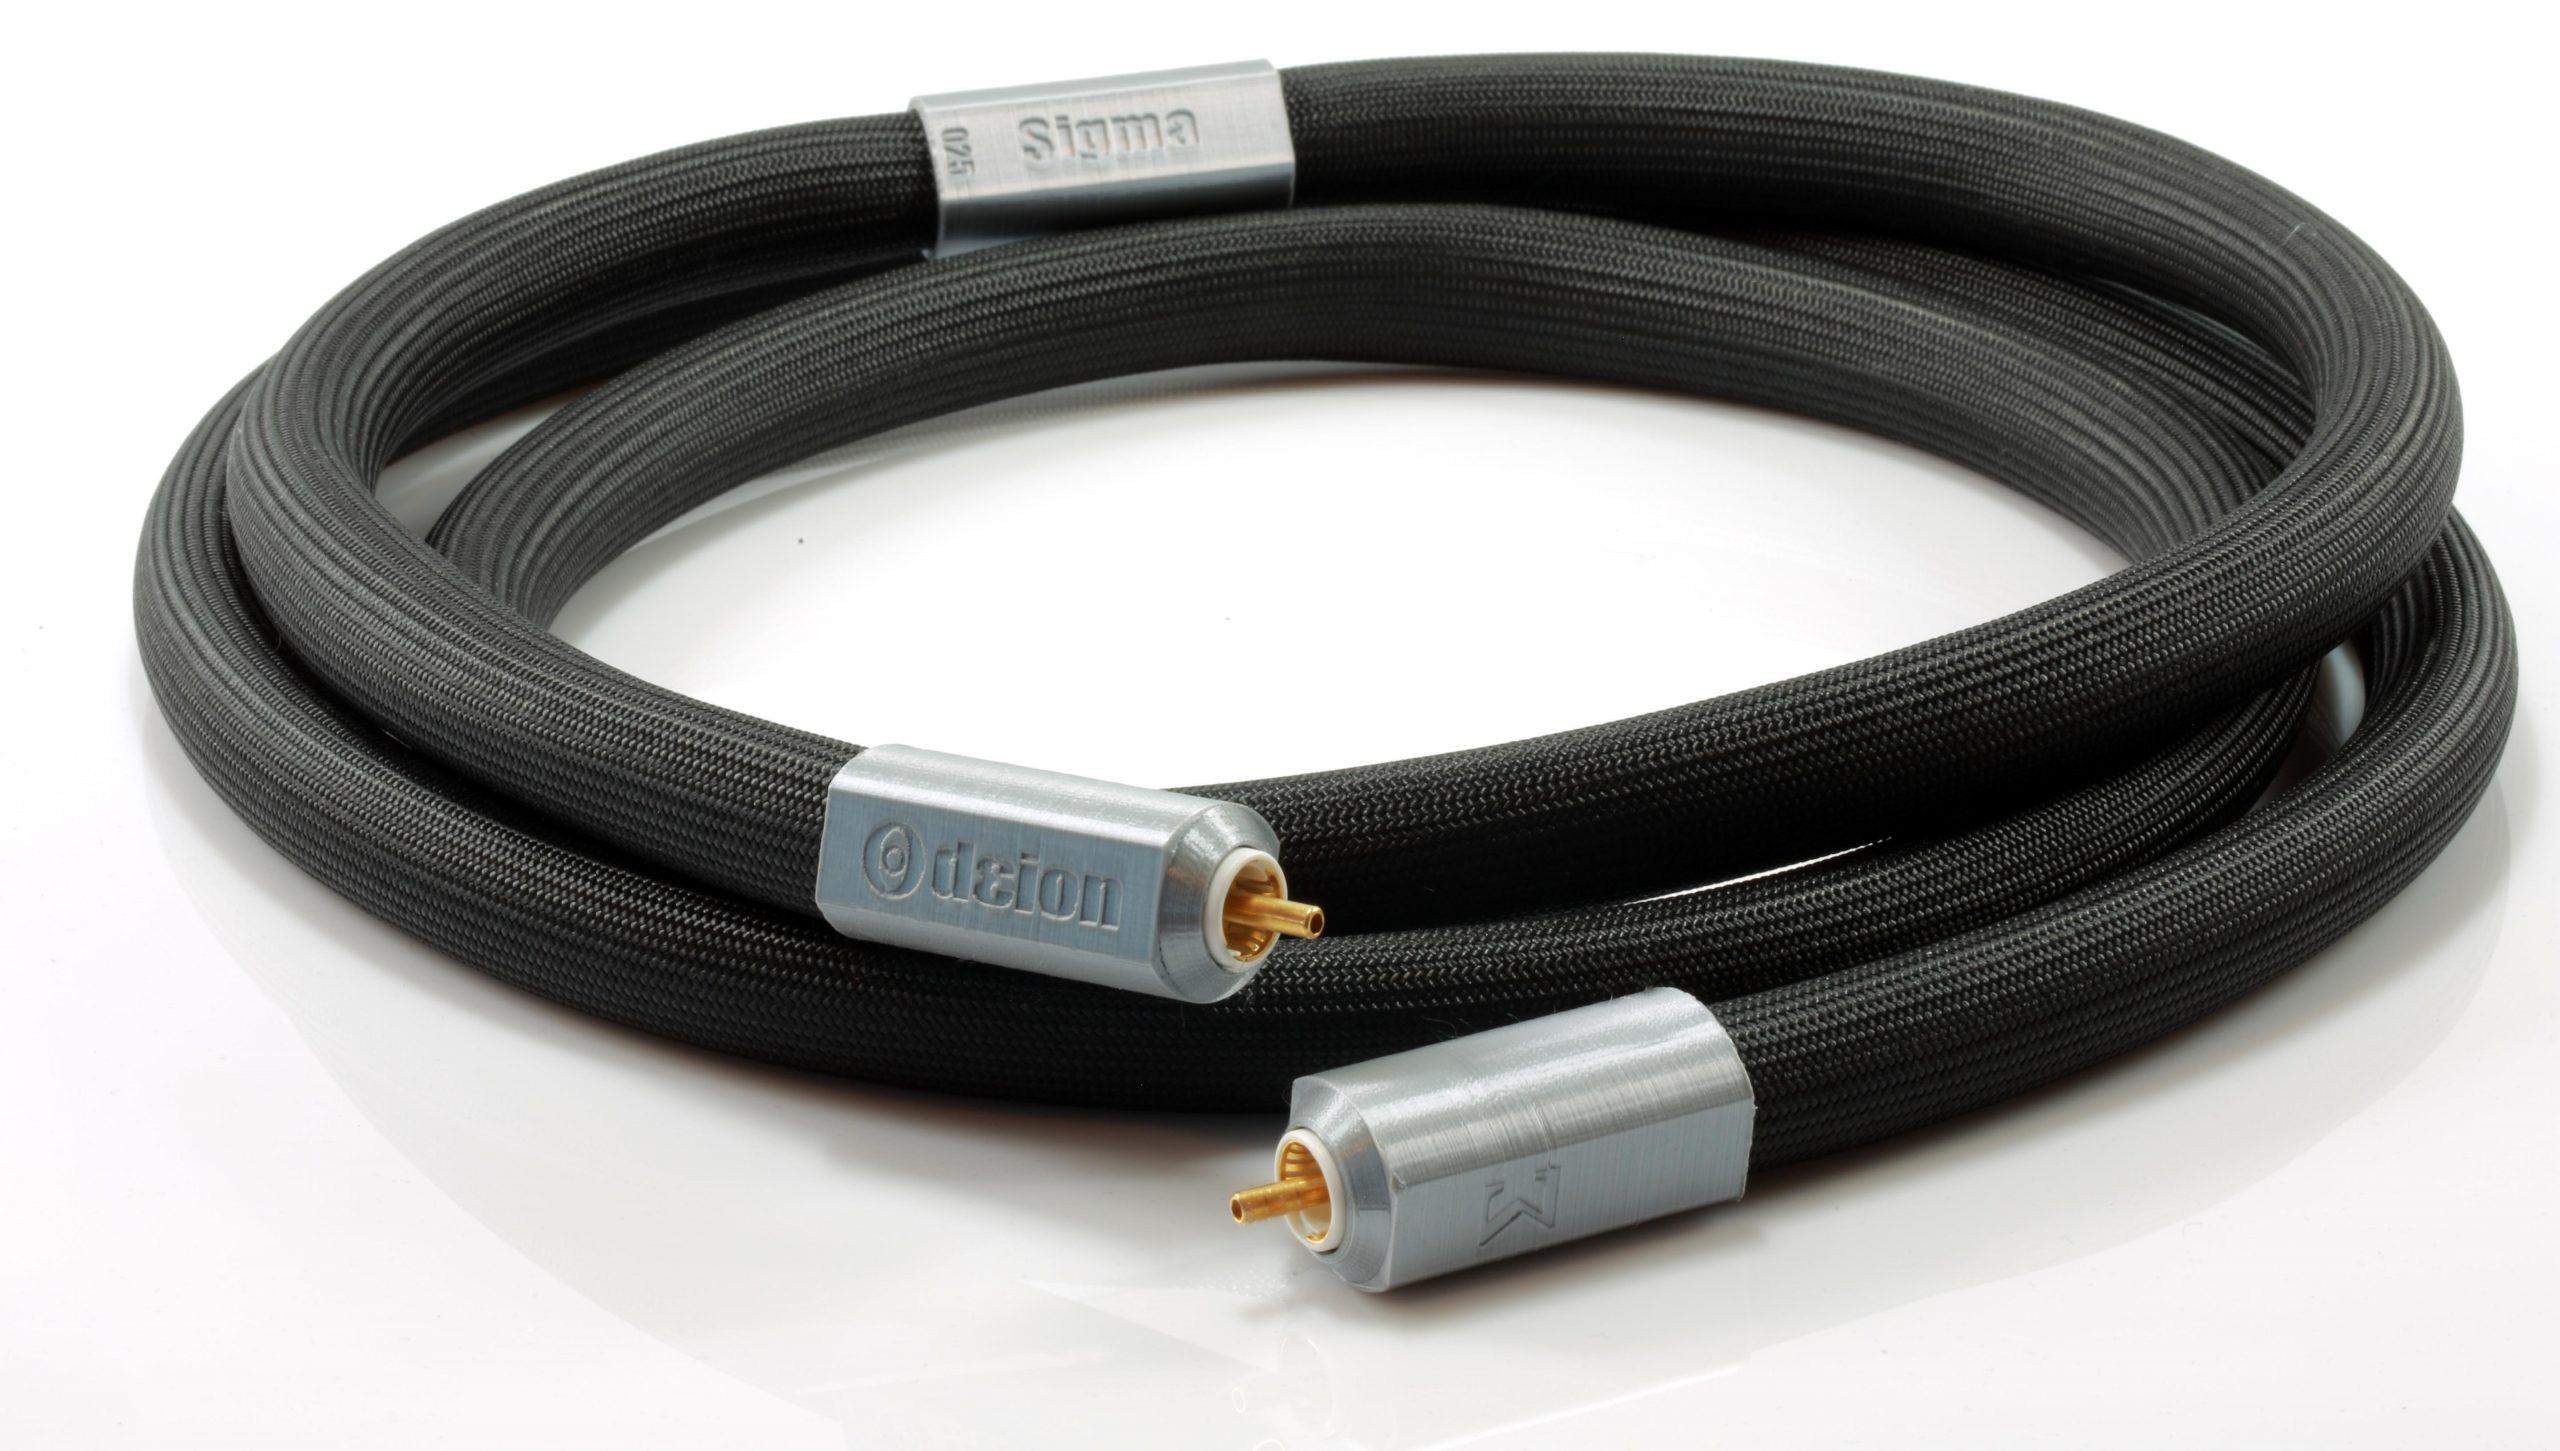 Sigma modulation mono sub rca graves basses odeion cables